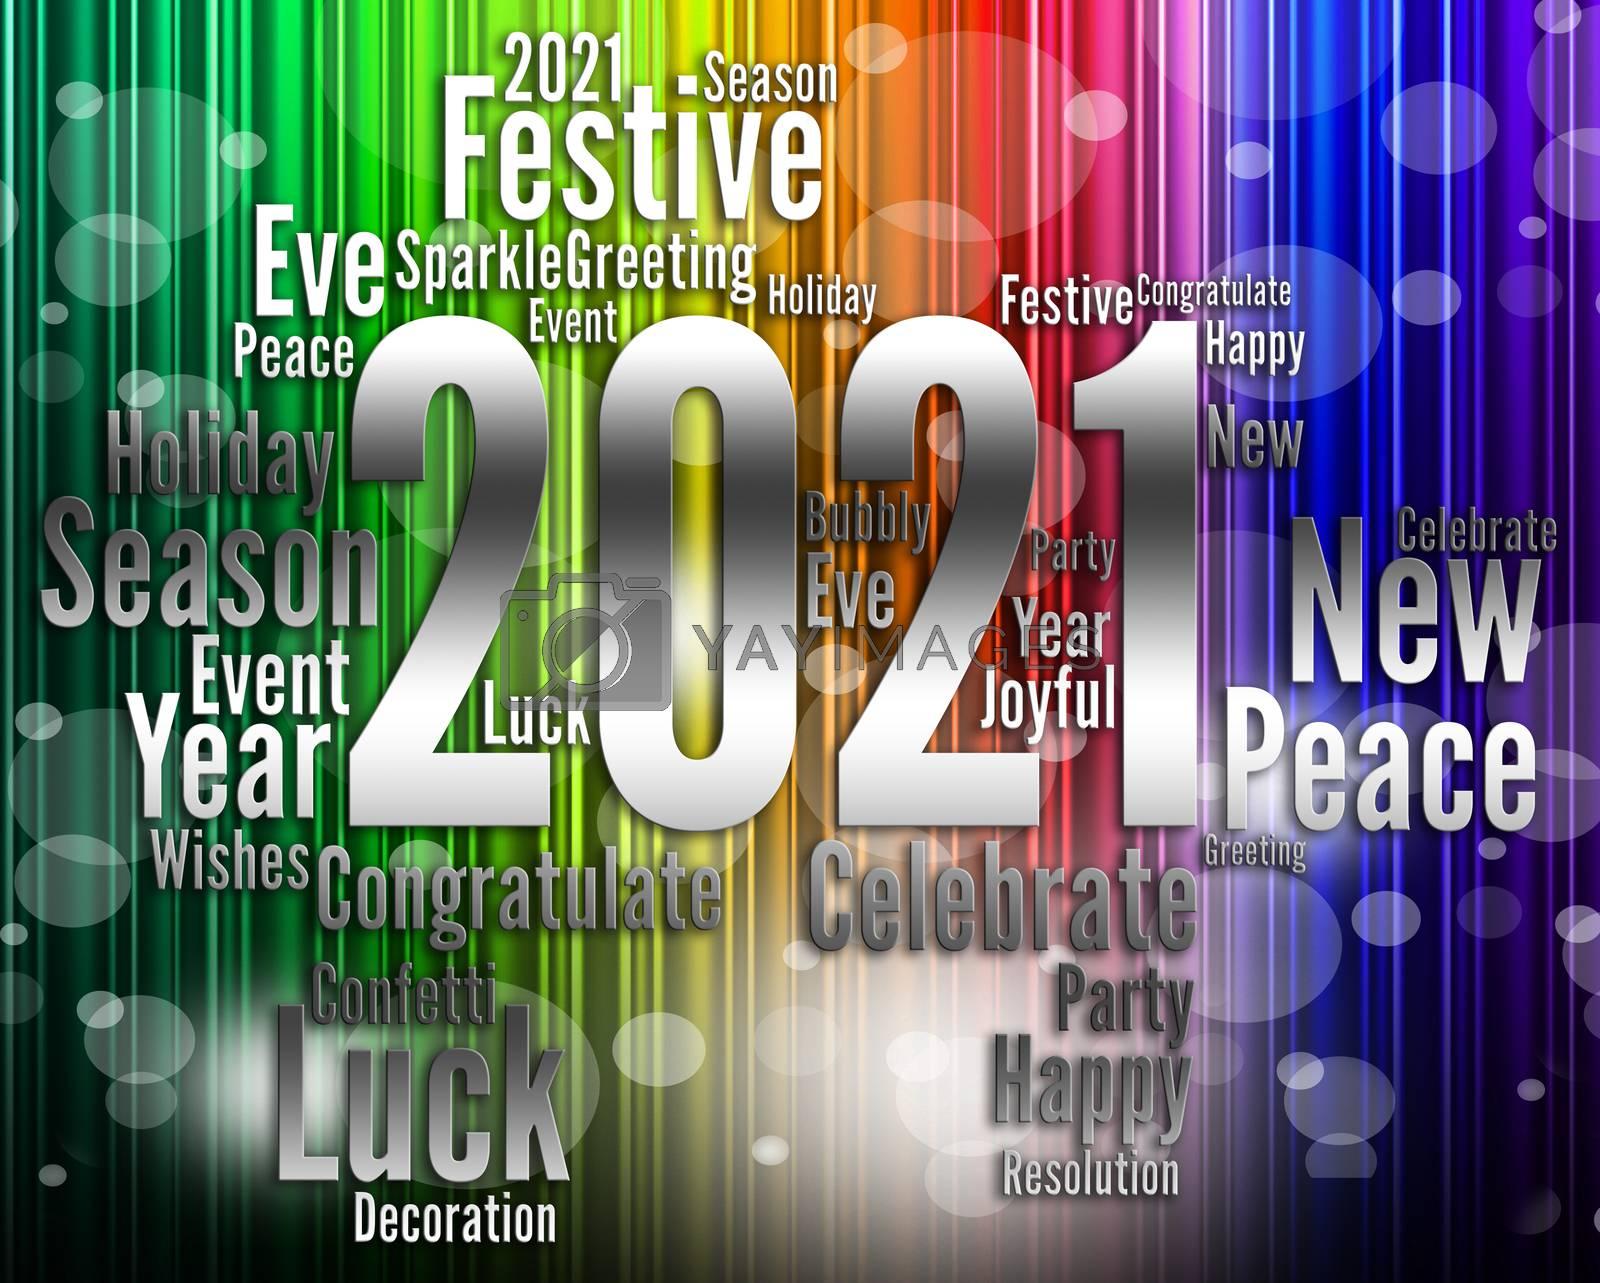 Twenty Twenty One Showing 2021 New Year Celebrating